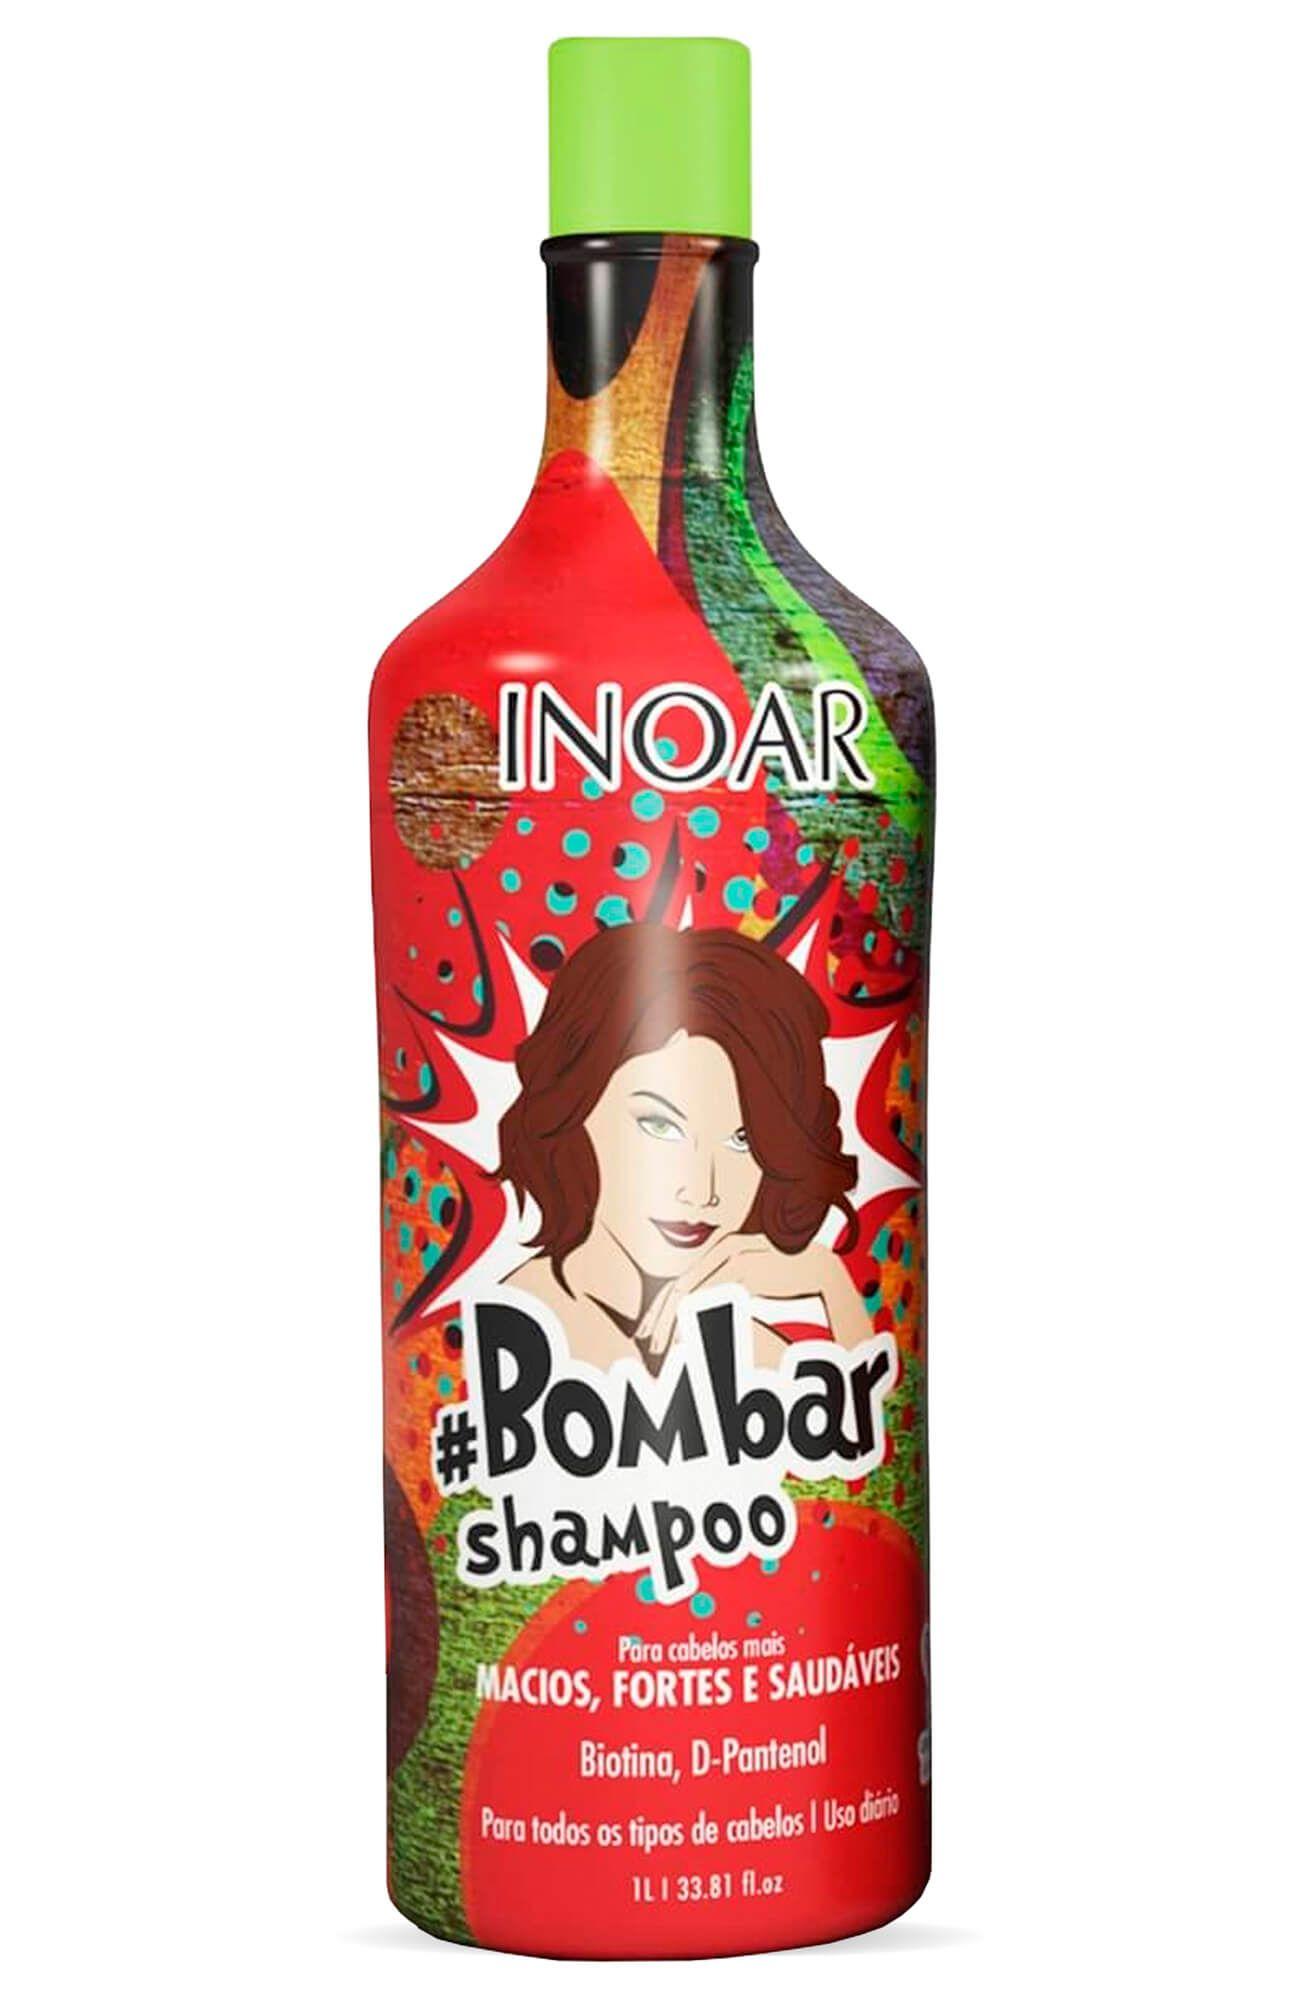 de39afcb0 Kit Inoar #bombar (shampoo E Condicionador) 1000ml - www ...